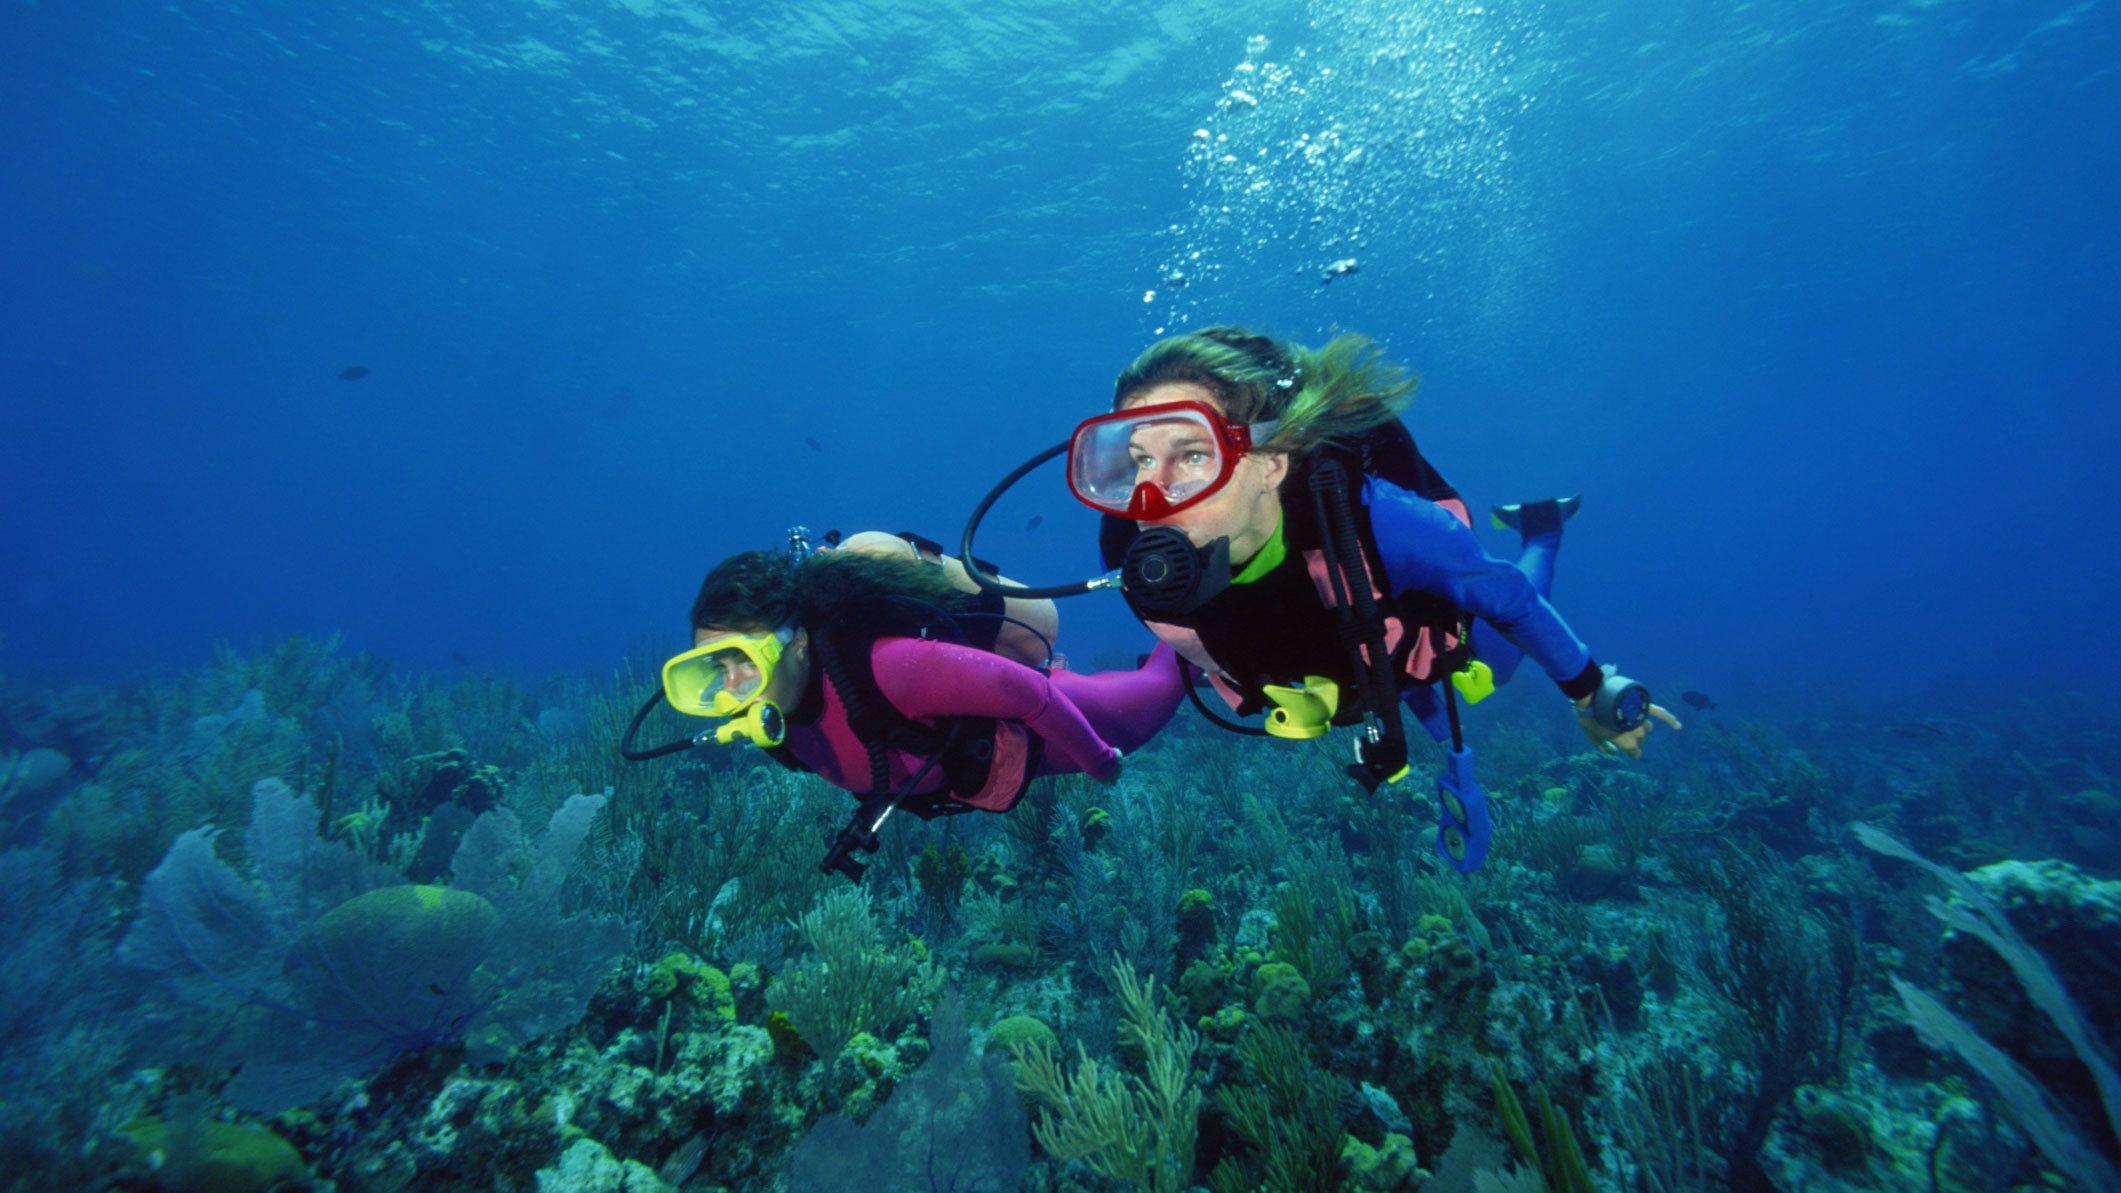 Pair of scuba divers near sea floor